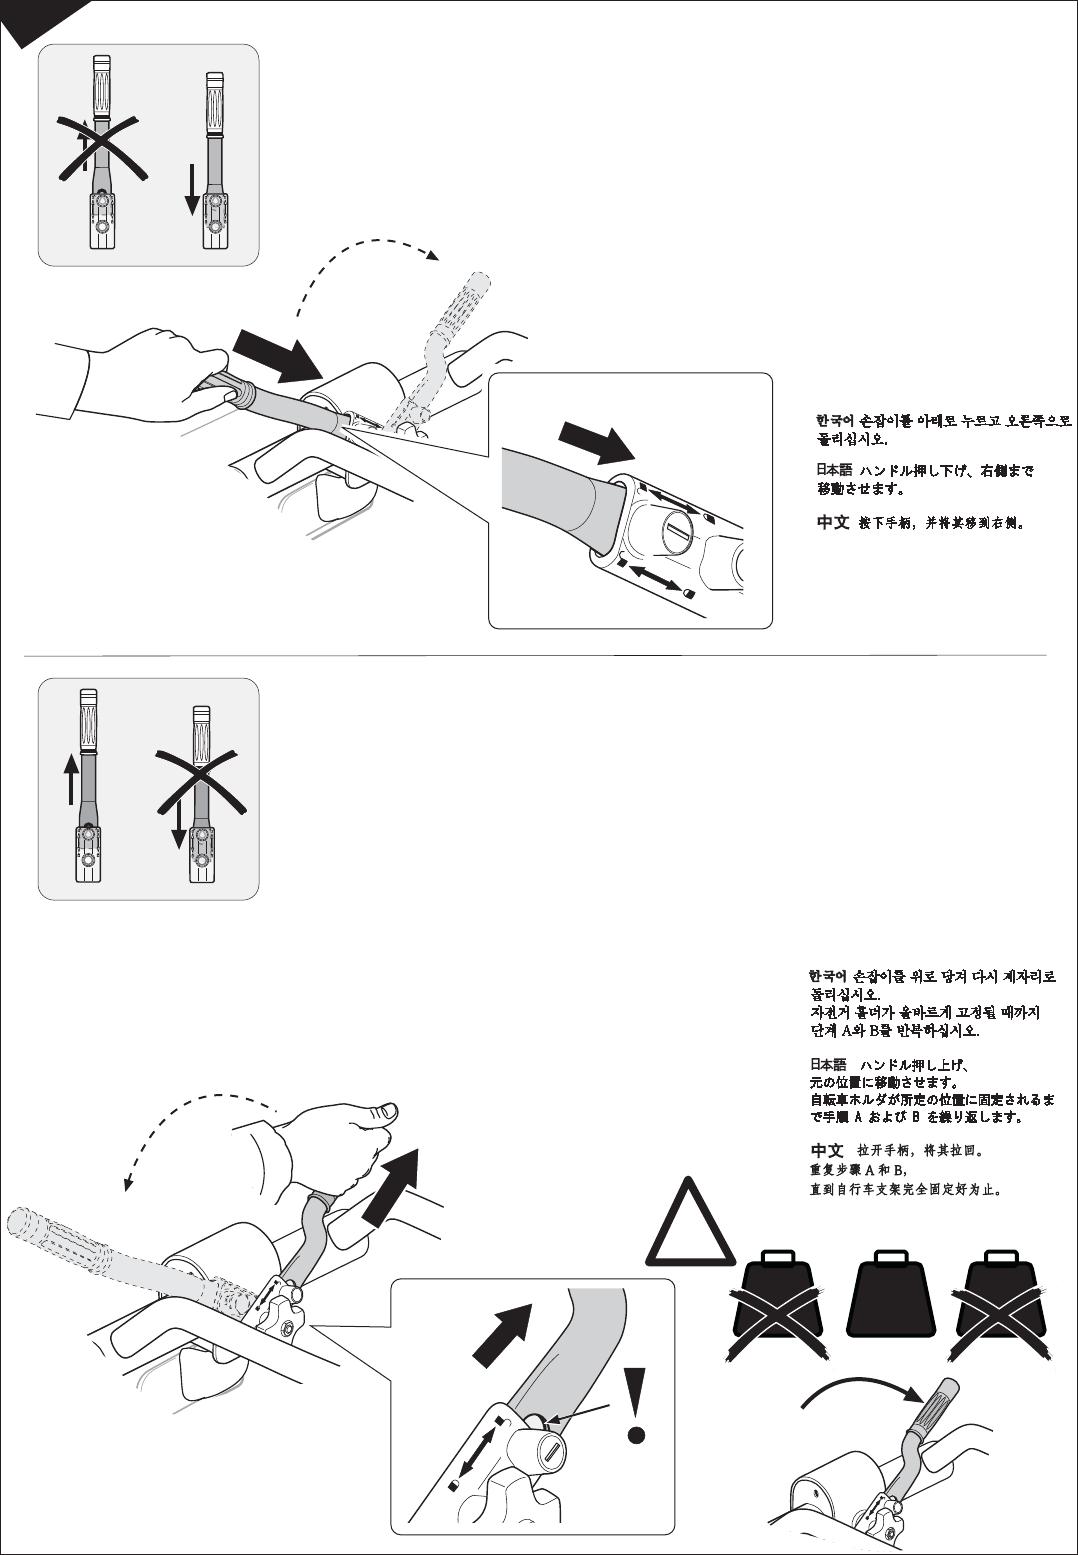 handleiding thule euroway 945 pagina 10 van 16 deutsch. Black Bedroom Furniture Sets. Home Design Ideas